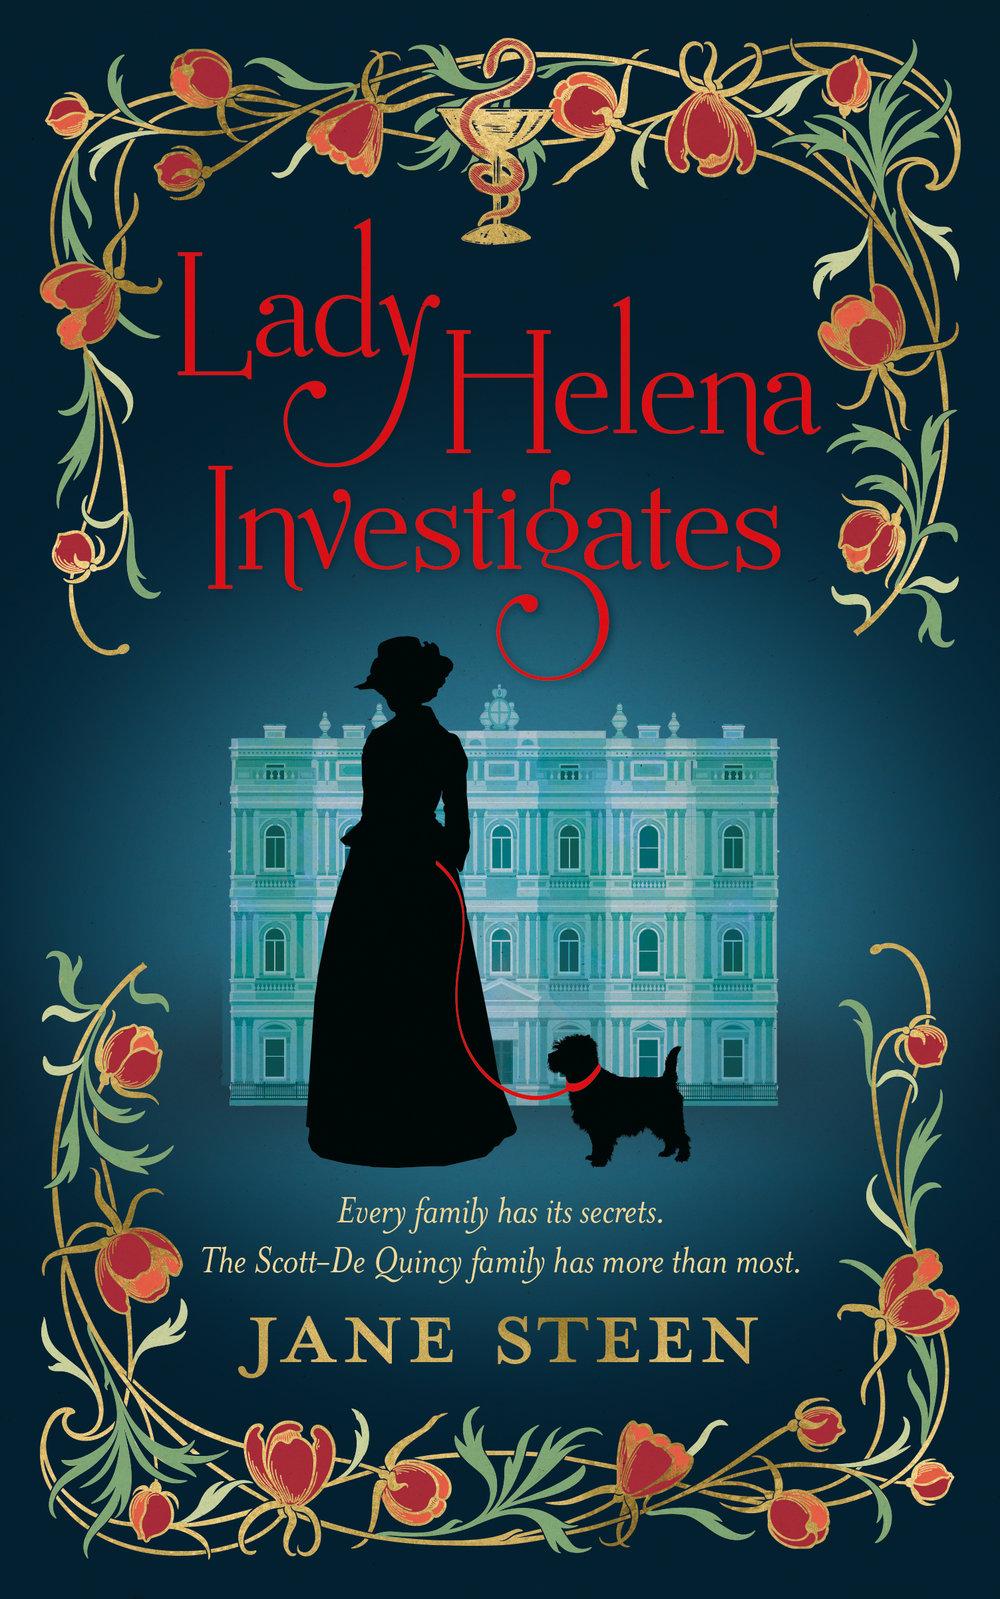 Lady Helena Investigates ebook cover.jpg